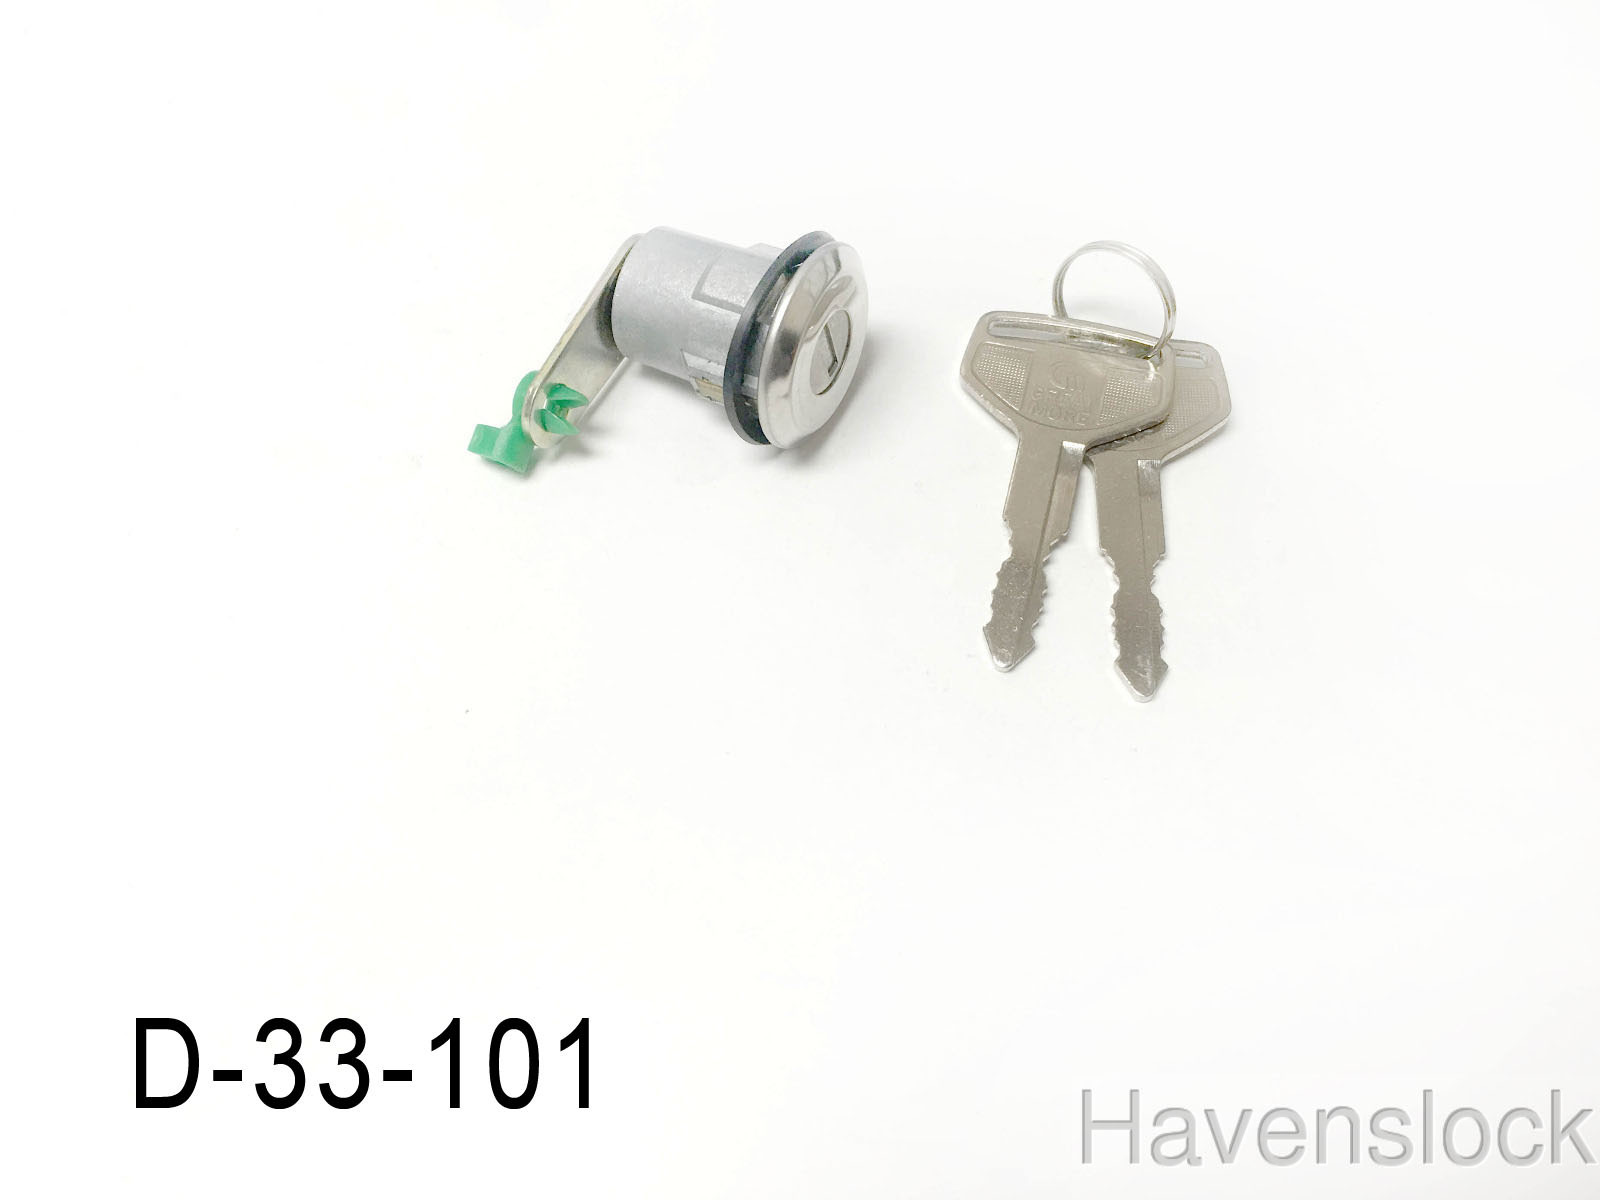 ASP Door Lock Cylinder D-33-101 for Suzuki and Che